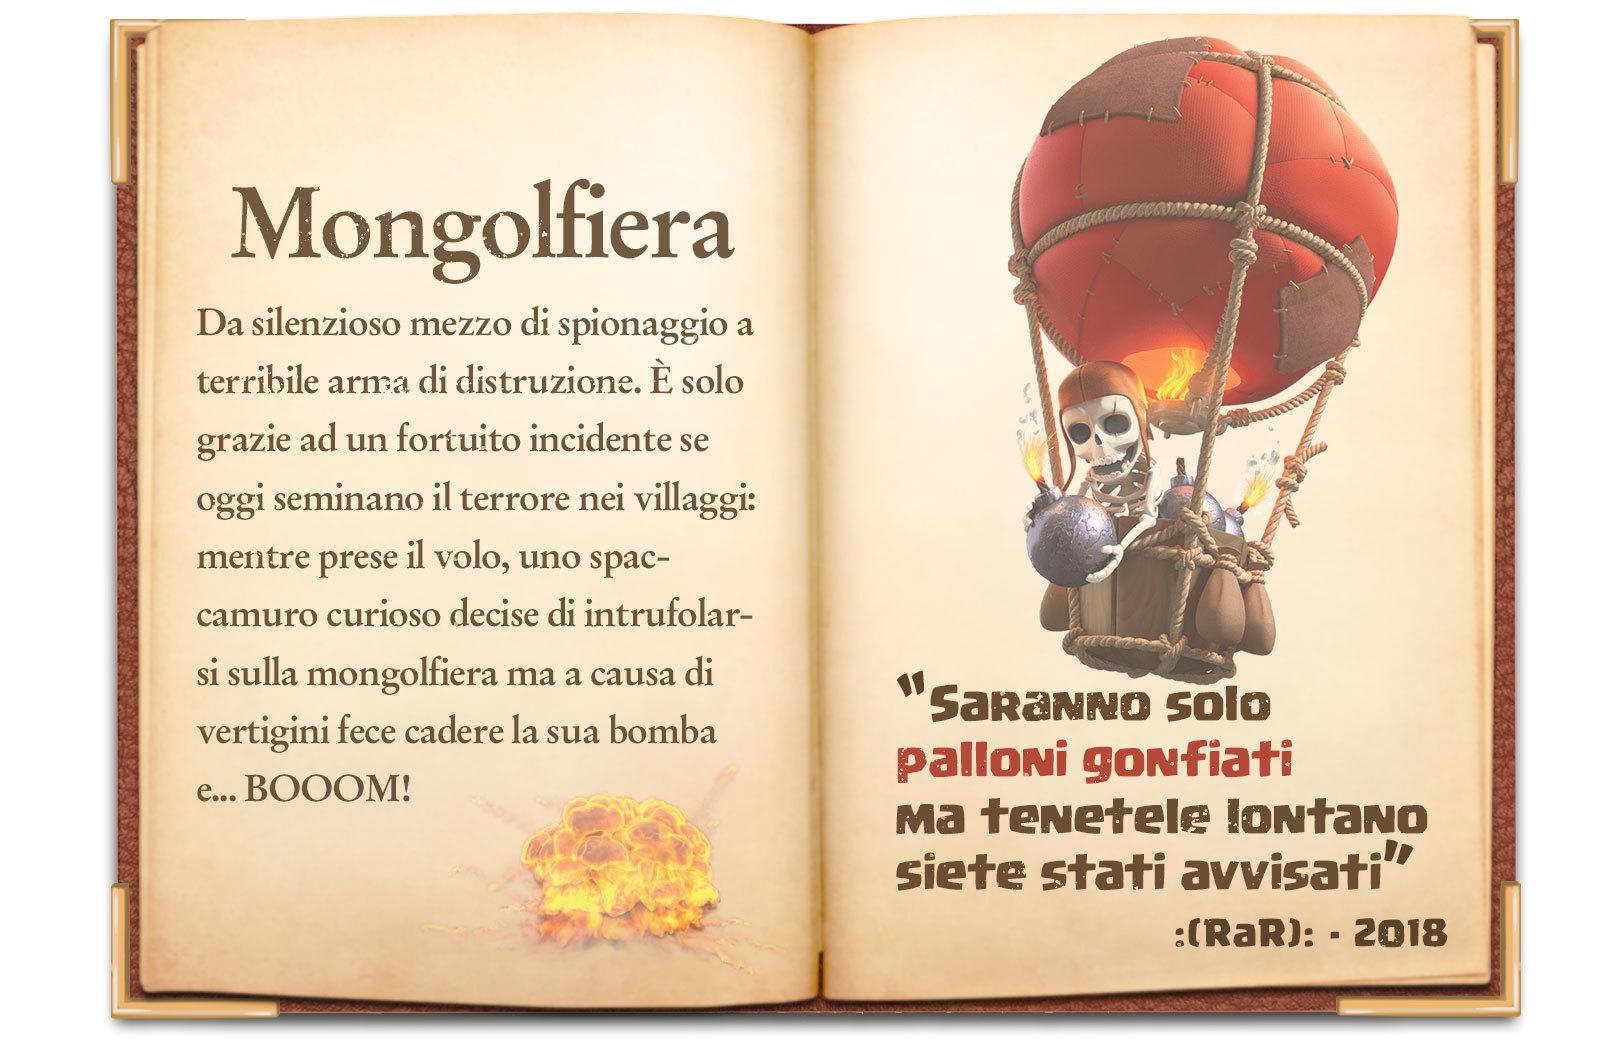 Ita_CoC_Clanslator_Book_1_MongolaFull.jpg?mtime=20180601060643#asset:5855